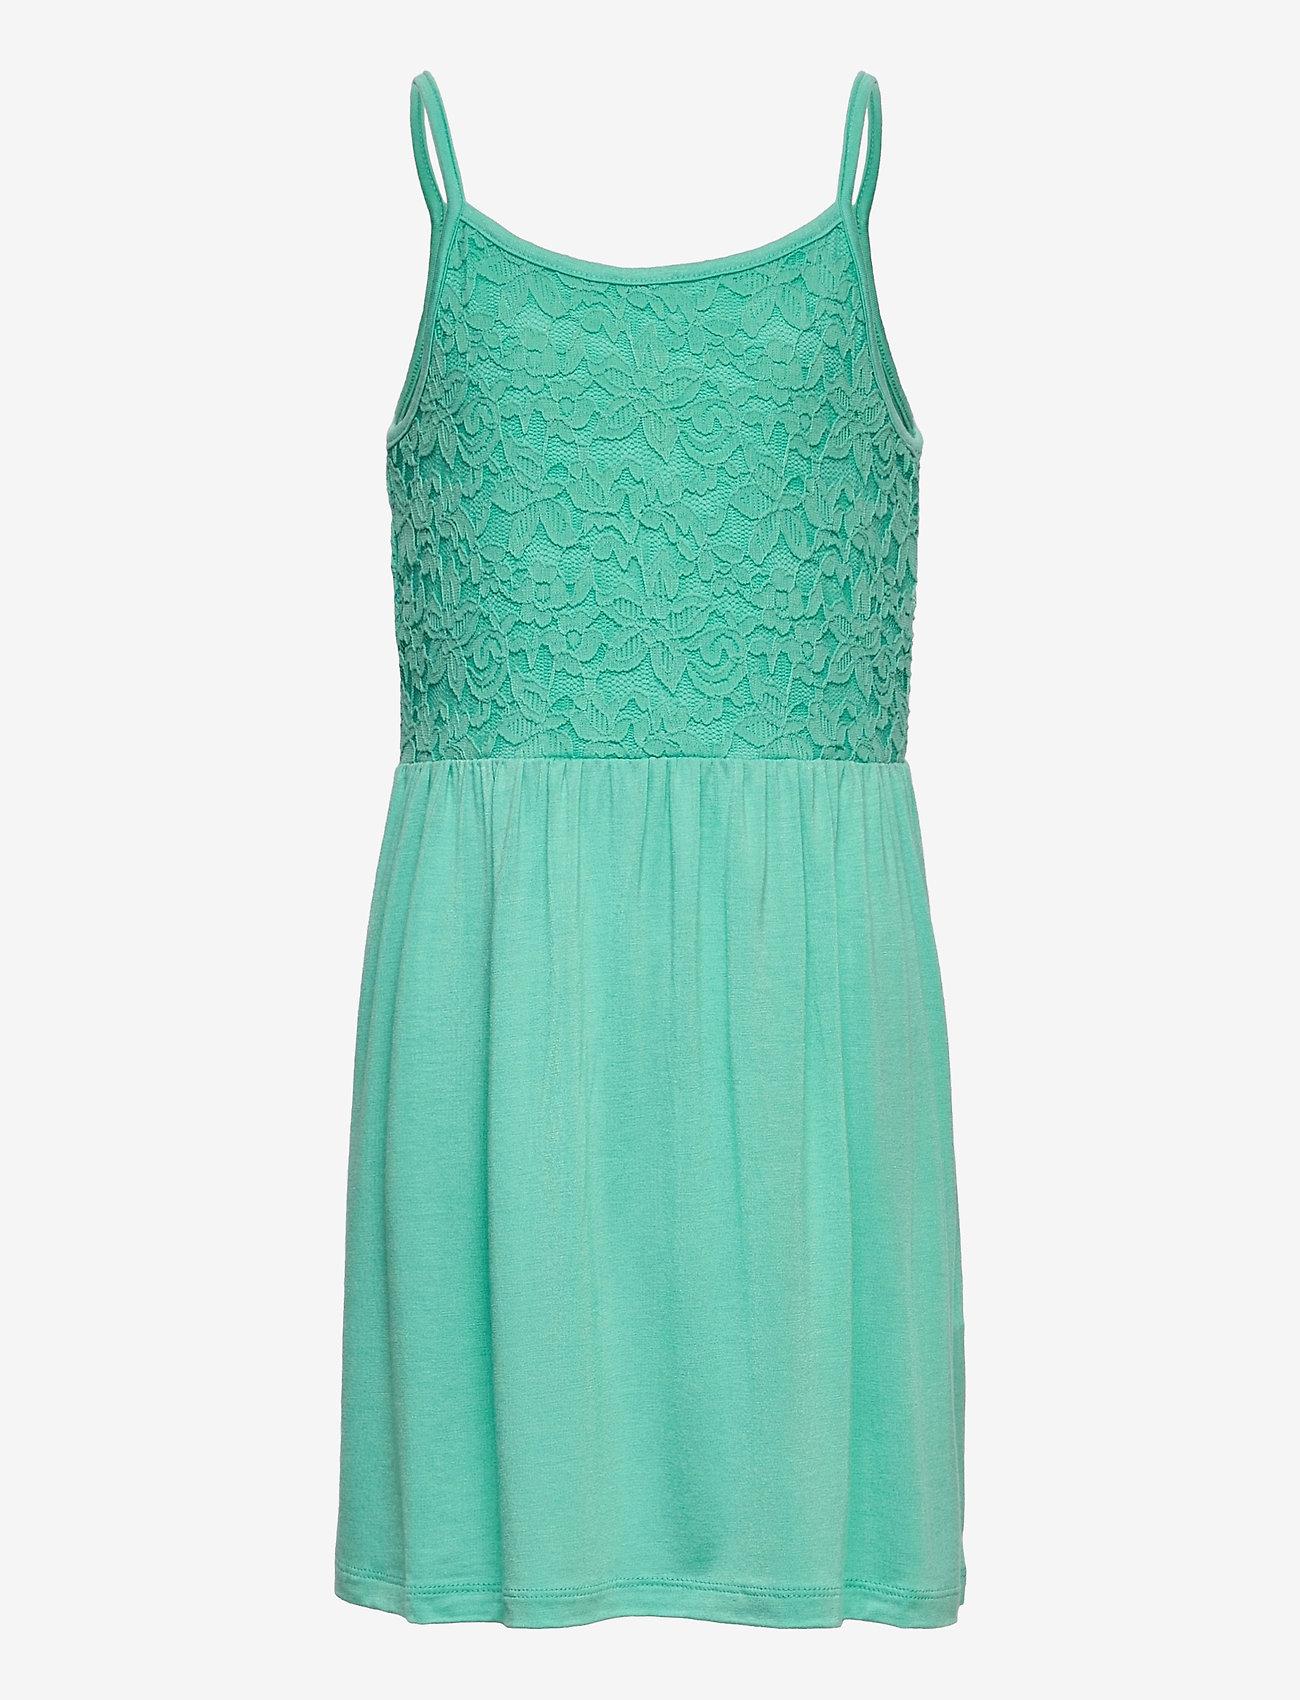 name it - NKFBEOLIVIA SL DRESS - kleider - pool blue - 0